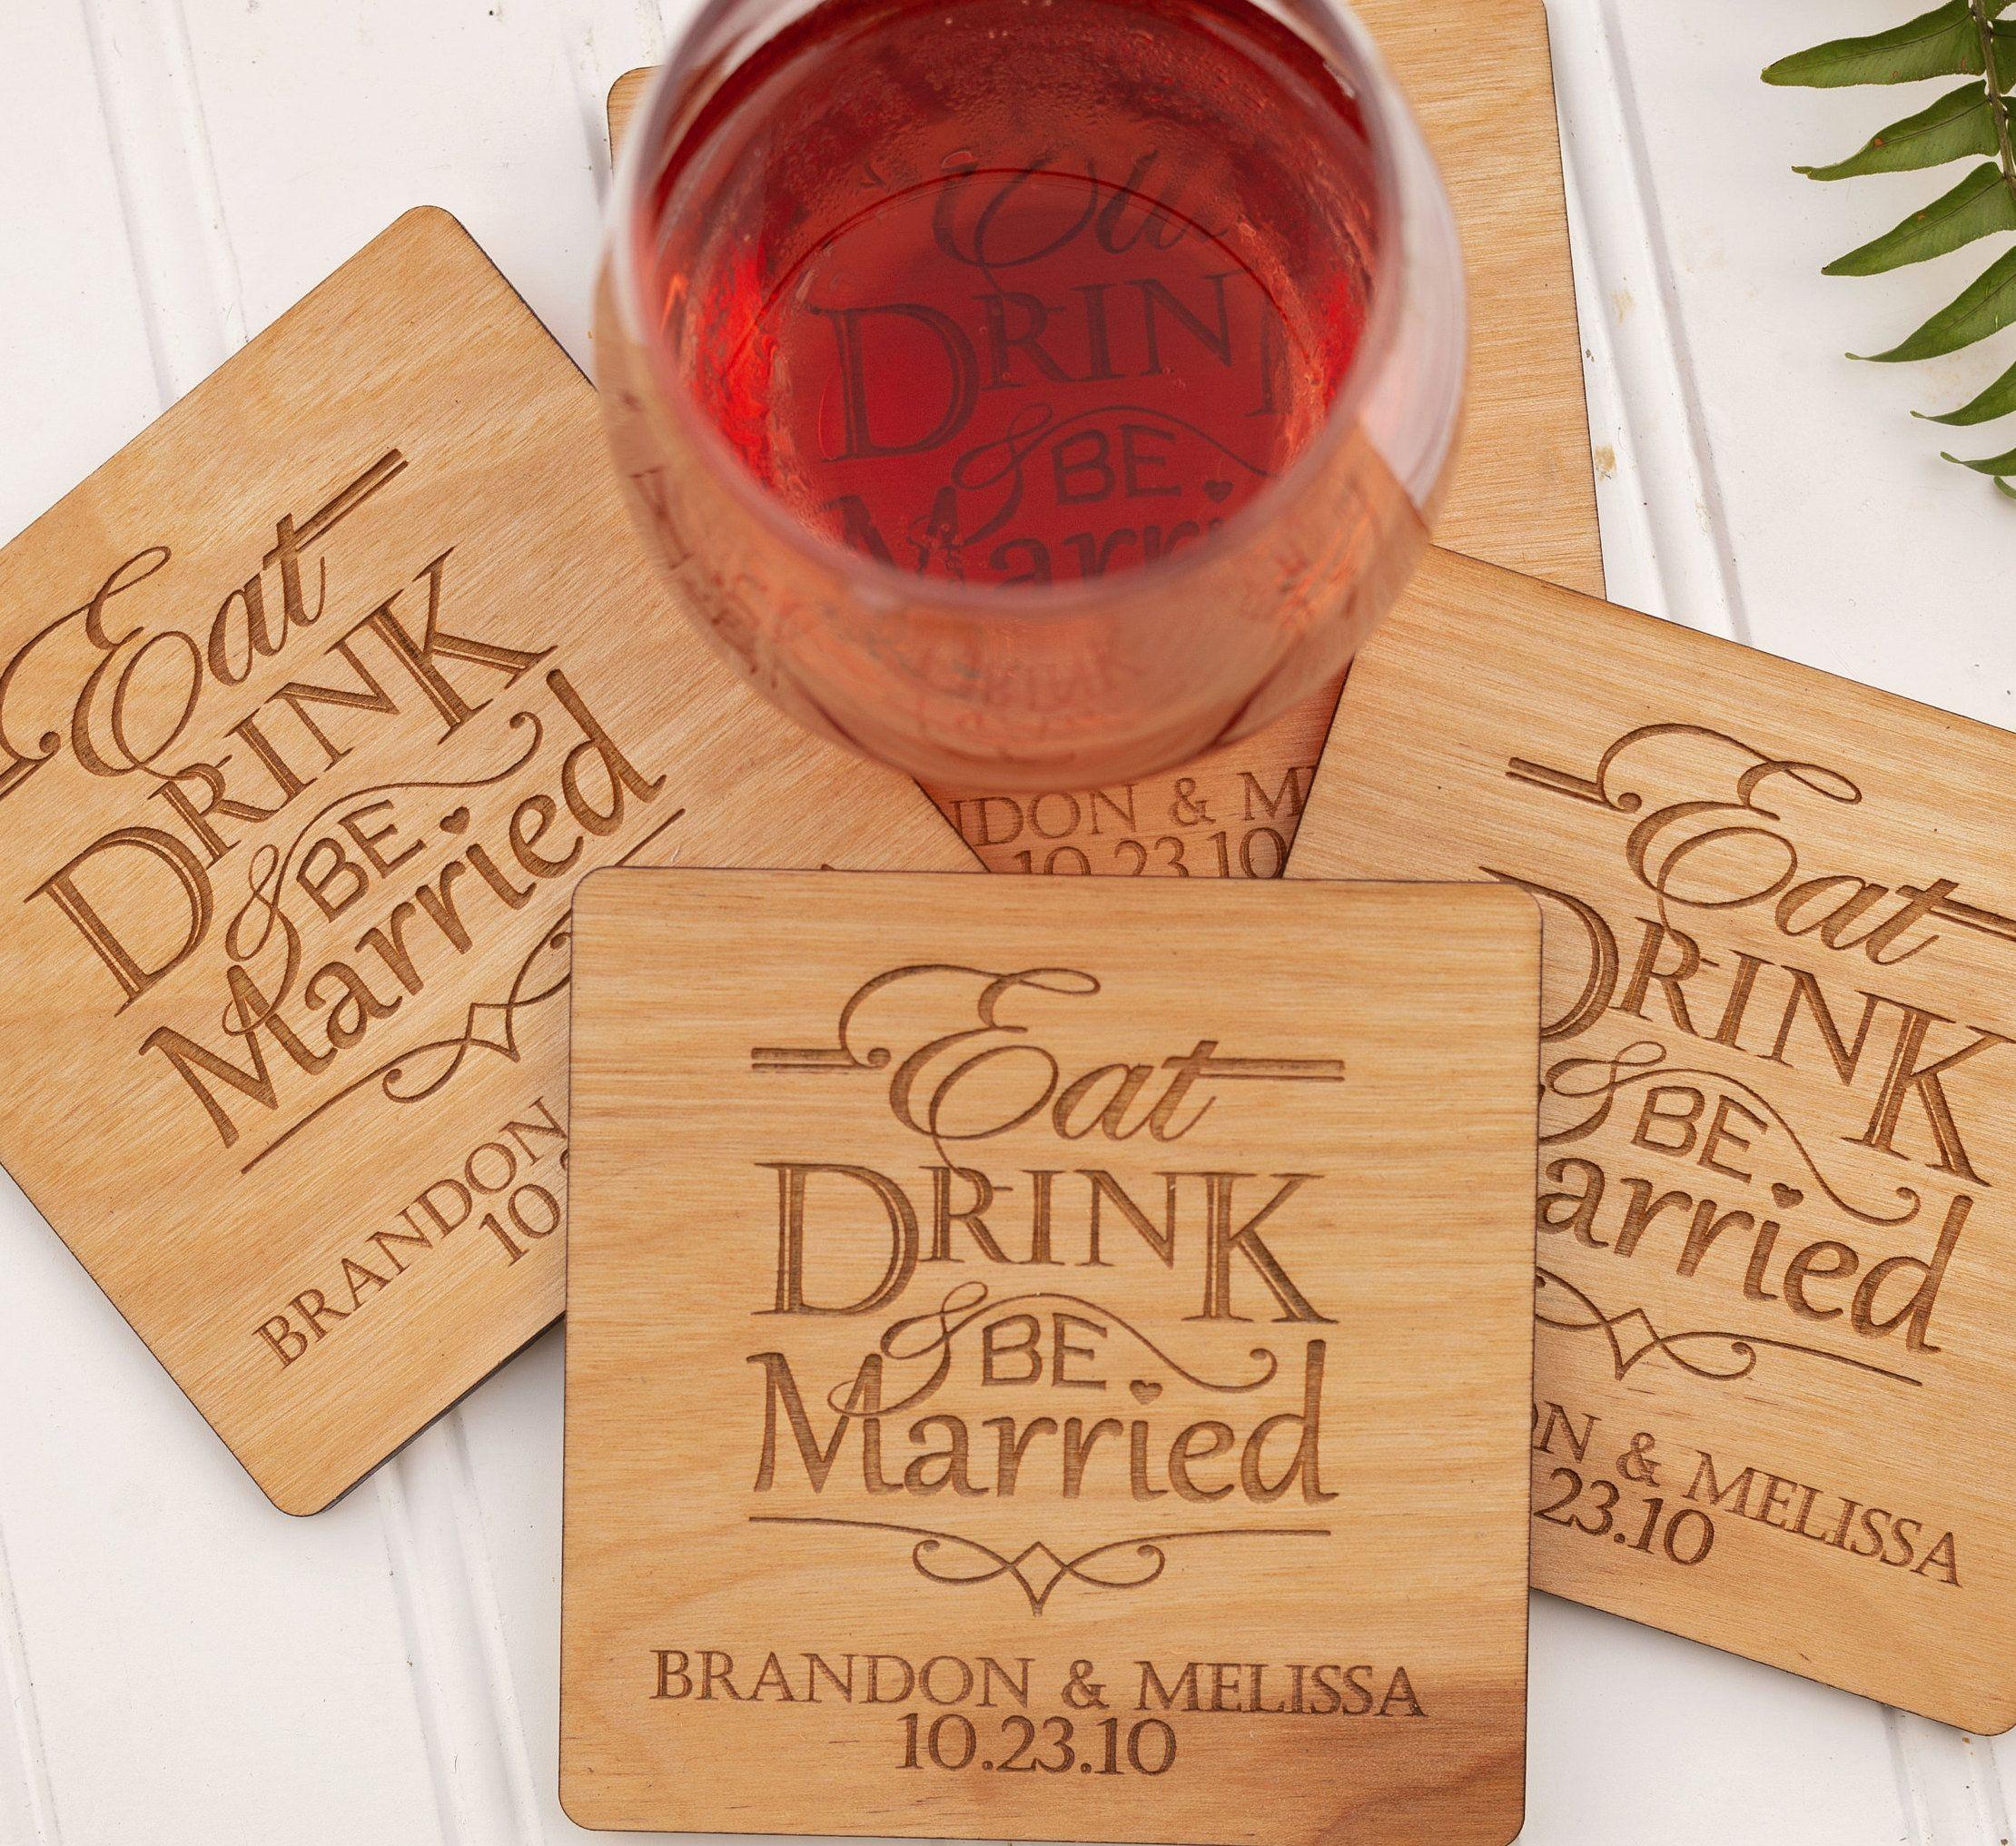 Custom Coaster Woodland Wedding Barn Wedding Decor Drink Coaster Personalized Coasters Rustic Wedding Wedding Favor Wedding Coasters